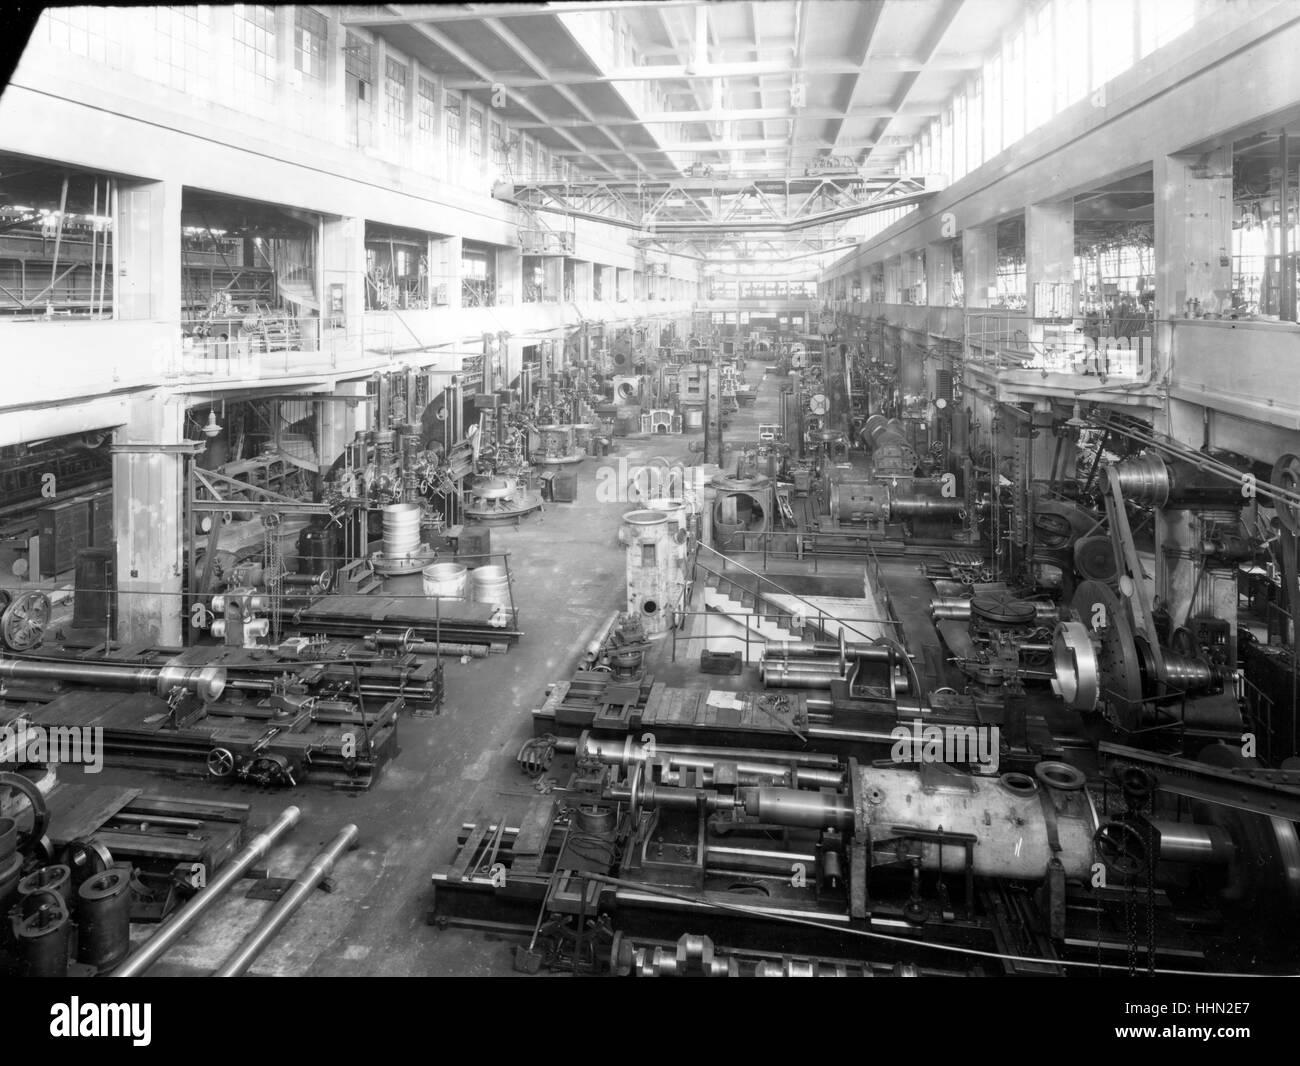 1930 - 40. Fiat - Ansaldo grandes motores en fábrica Genua, San Pier d'Arena, sanpierdarena. Imagen De Stock